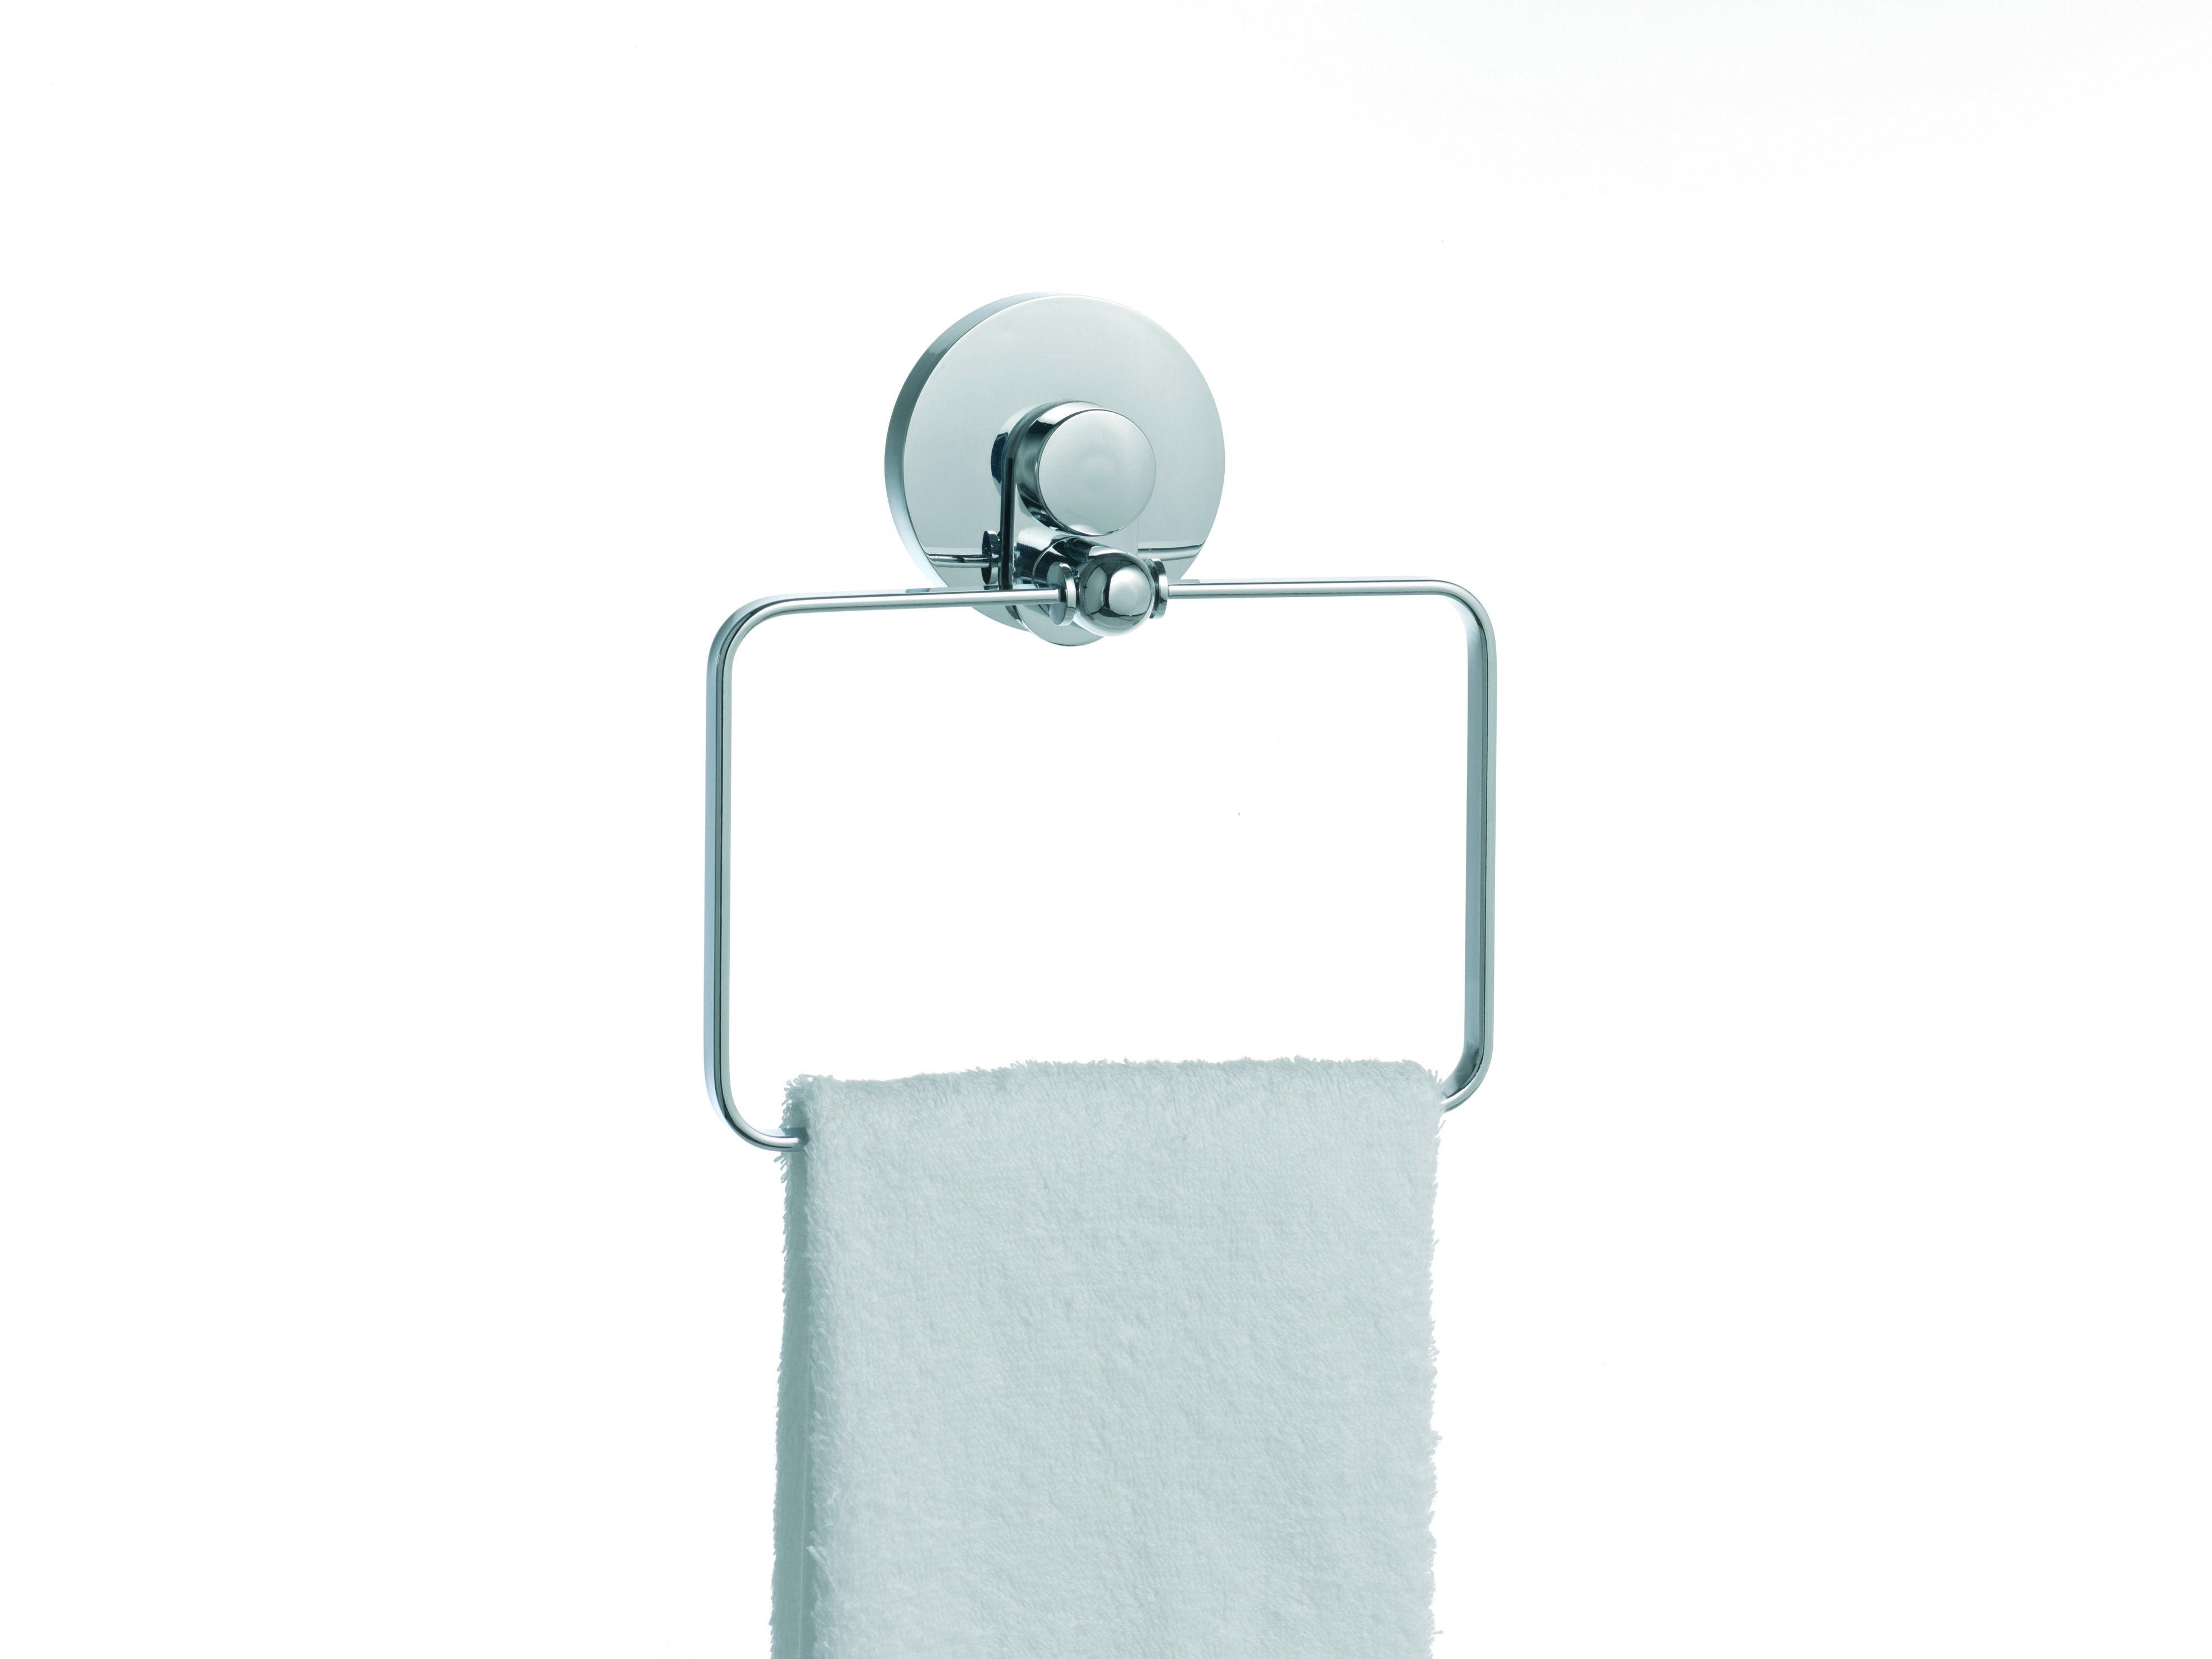 Everloc Bathroom Accessories - Everloc solutions towel ring product code 67006